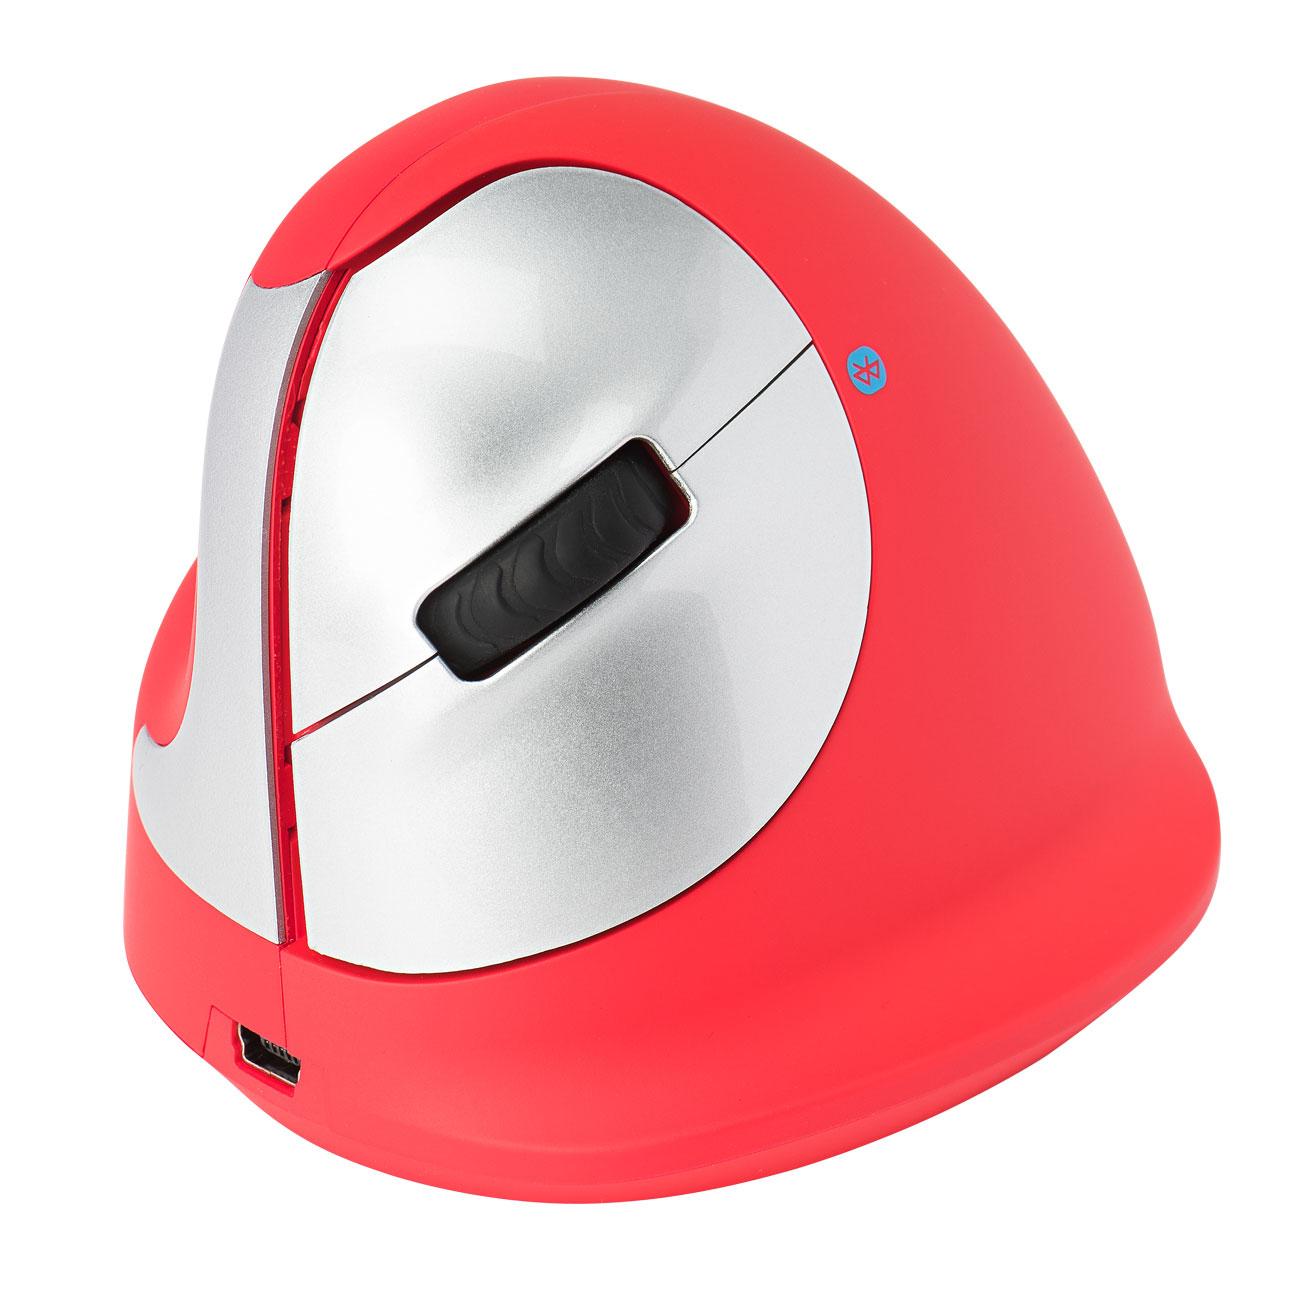 R-Go HE Sport, Ergonomische muis, Rood, Bluetooth, Medium (165-195mm), Linkshandig